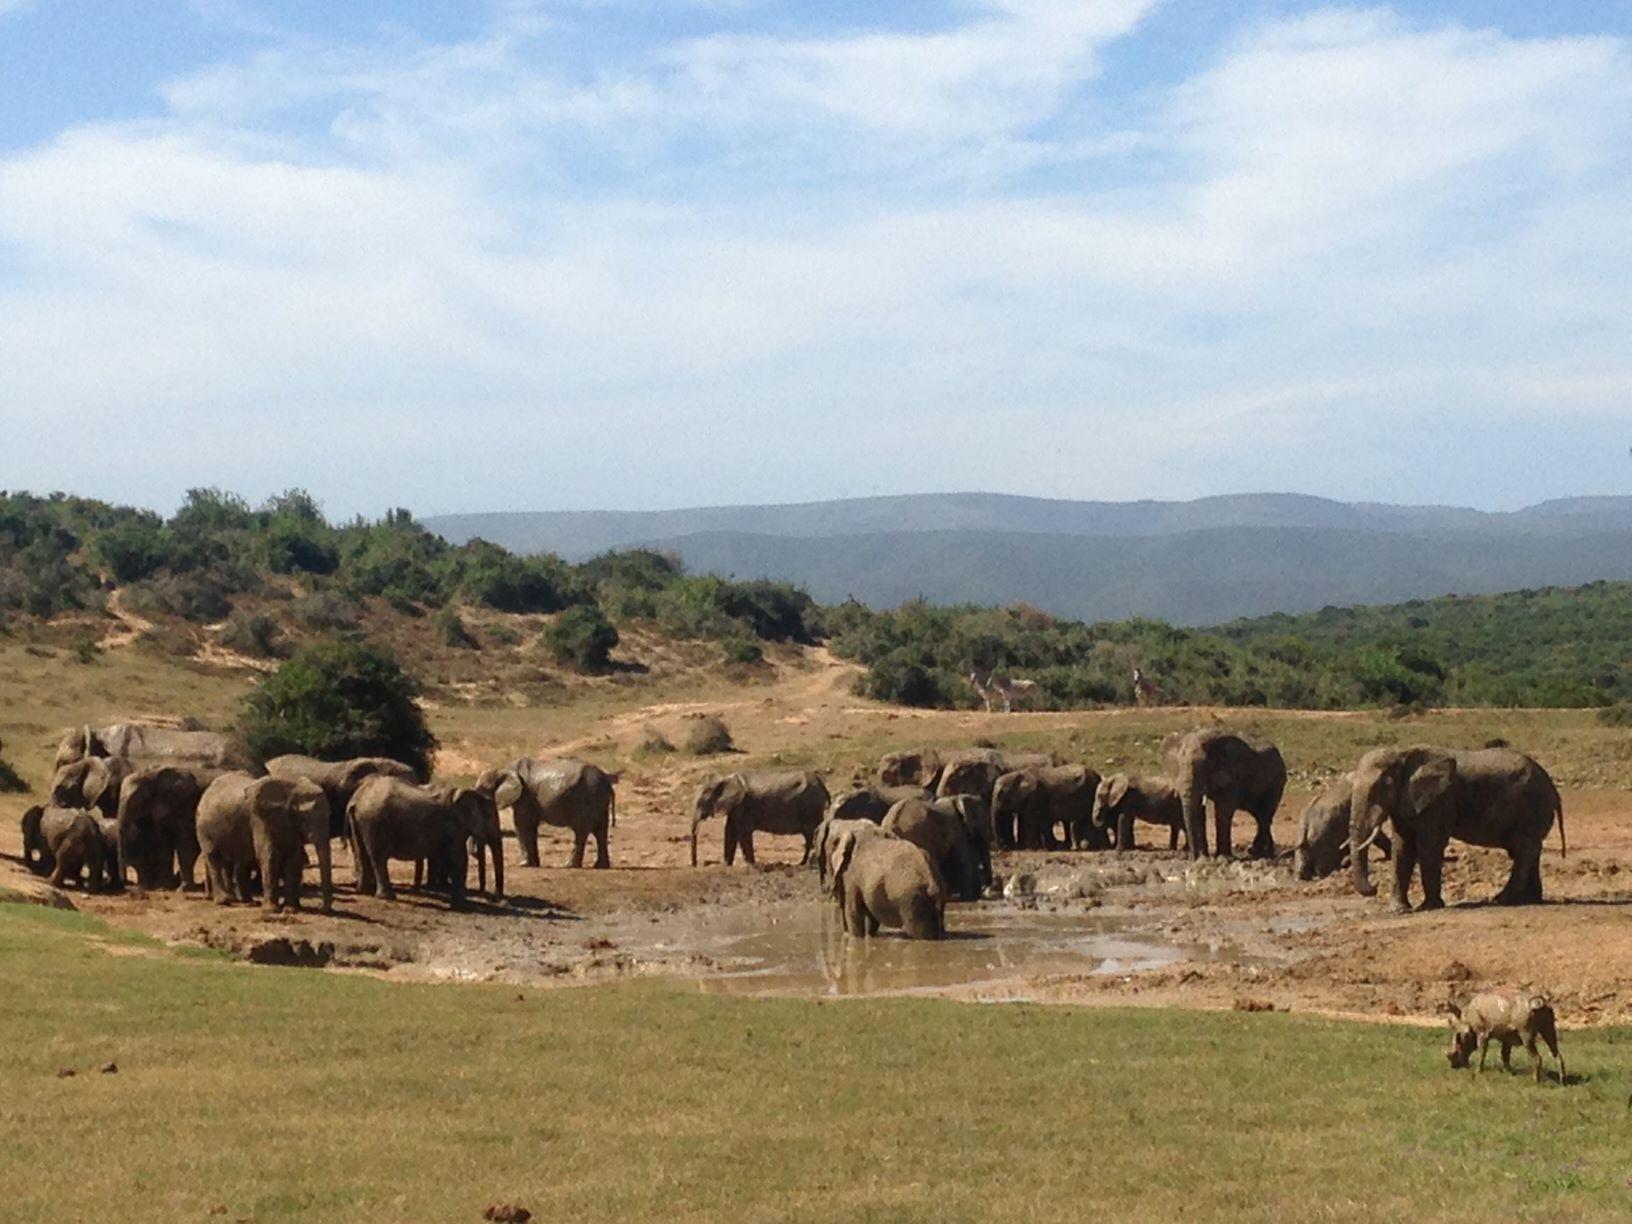 Elefanten am Wasserloch Addo Elephant national Park